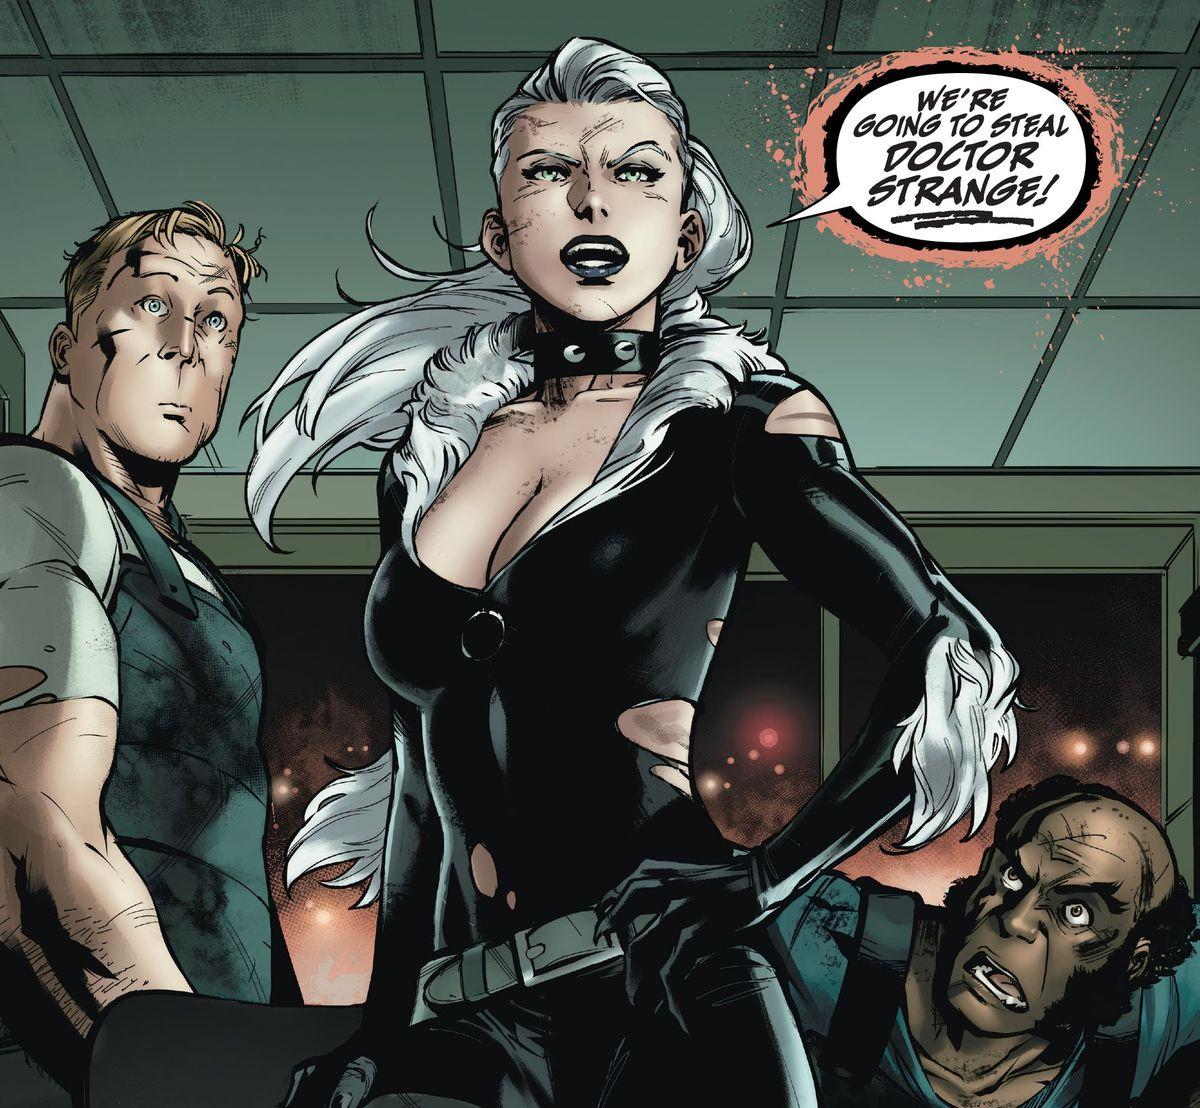 """We're going to steal Doctor Strange!"" declares Felicia Hardy/Black Cat in Black Cat #1, Marvel Comics (2020)."